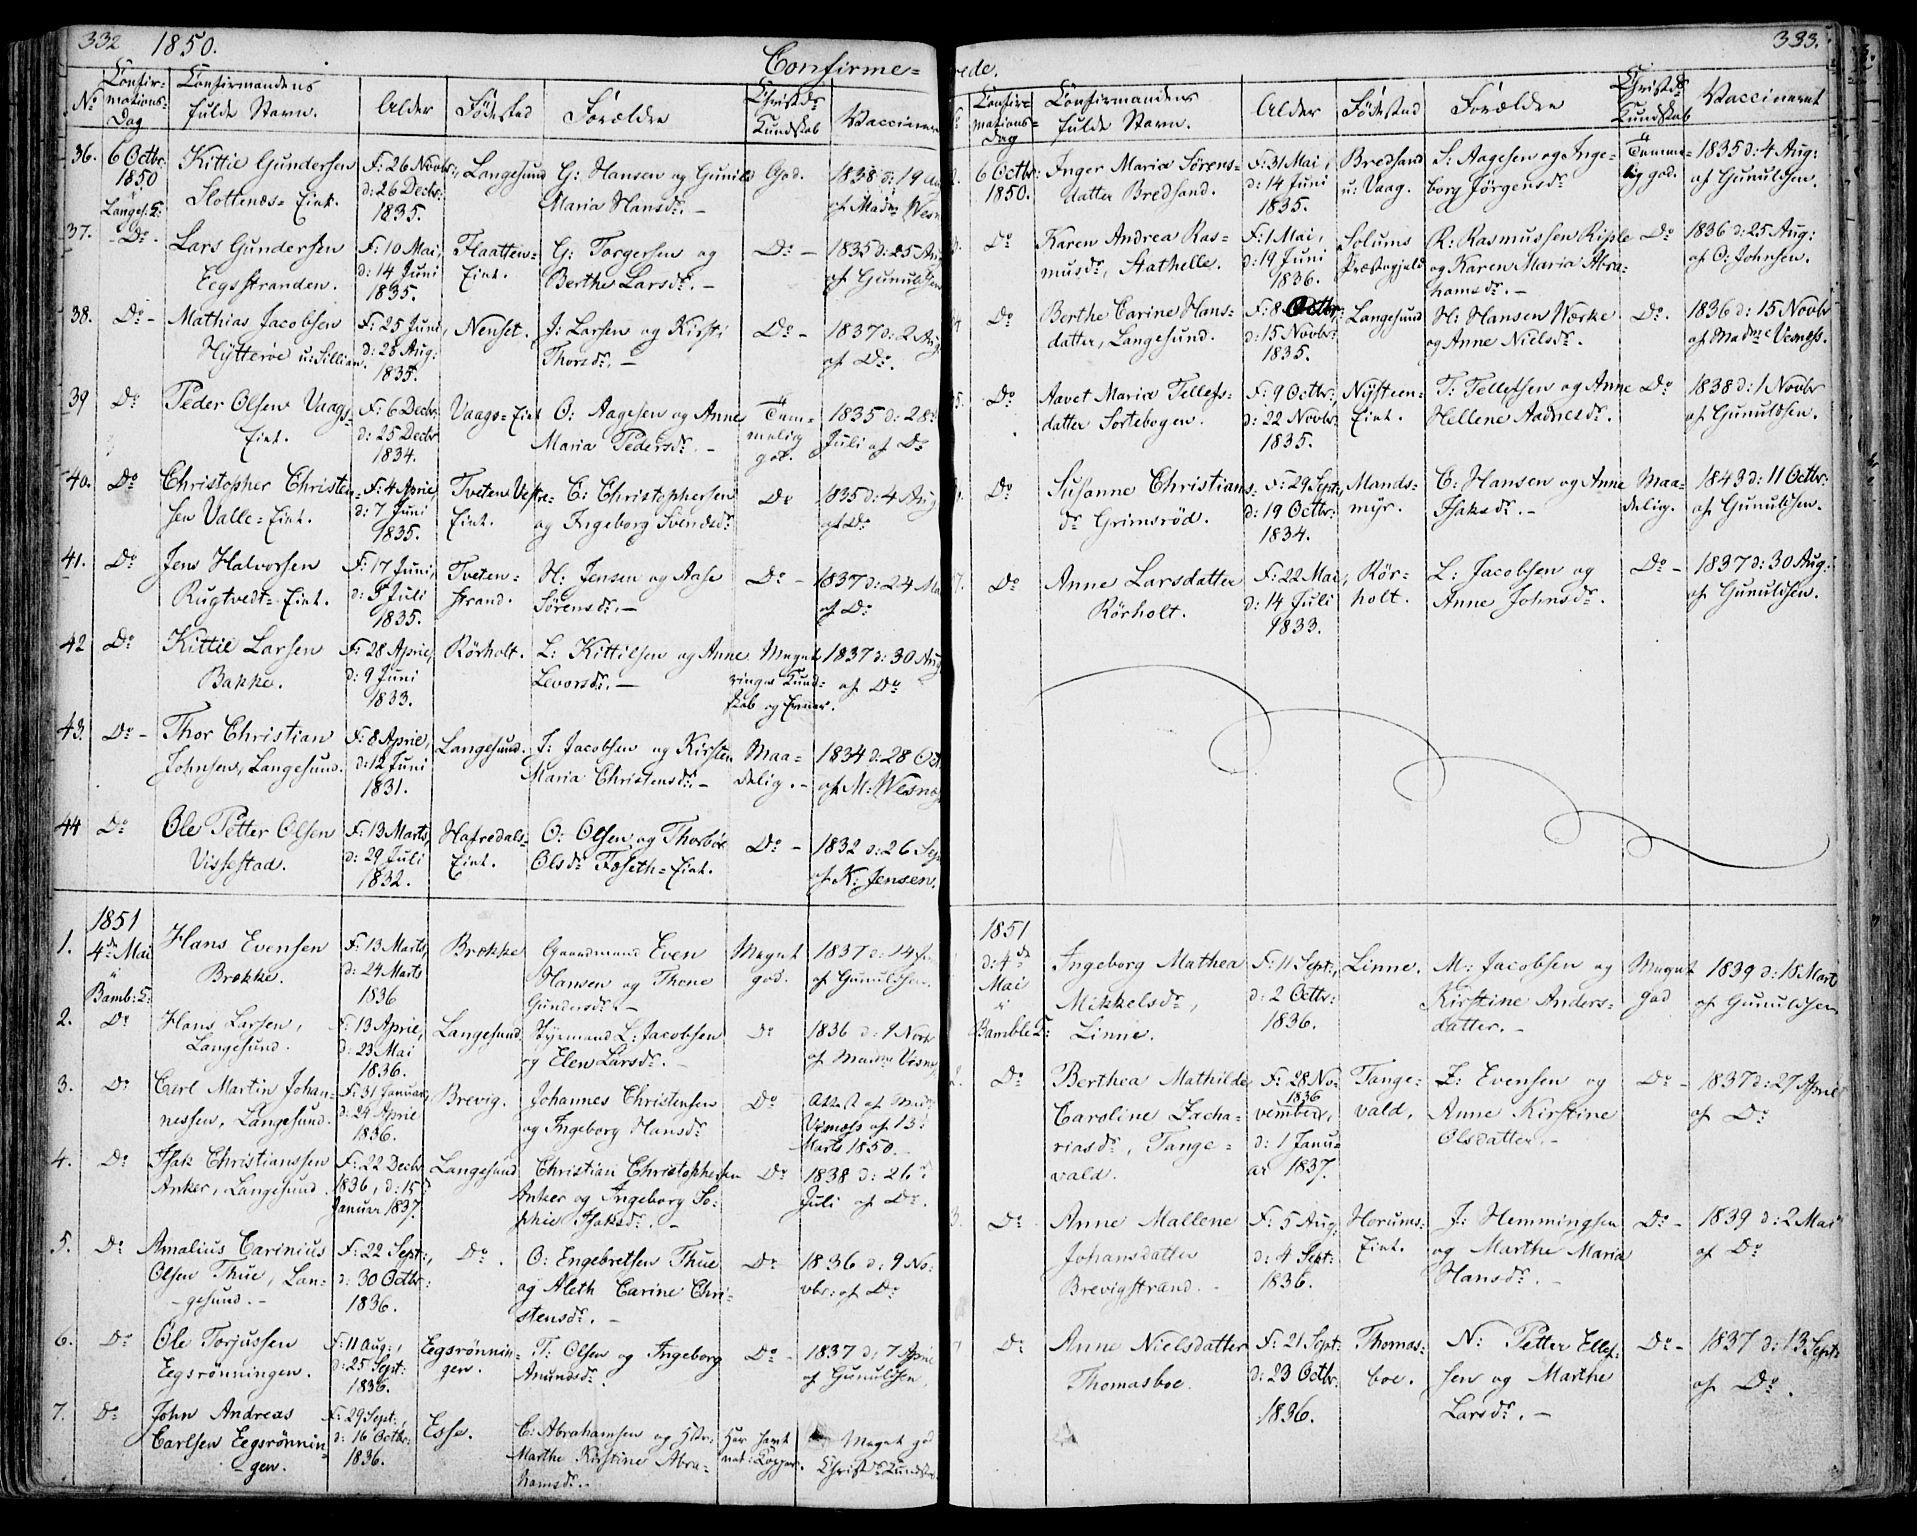 SAKO, Bamble kirkebøker, F/Fa/L0004: Ministerialbok nr. I 4, 1834-1853, s. 332-333